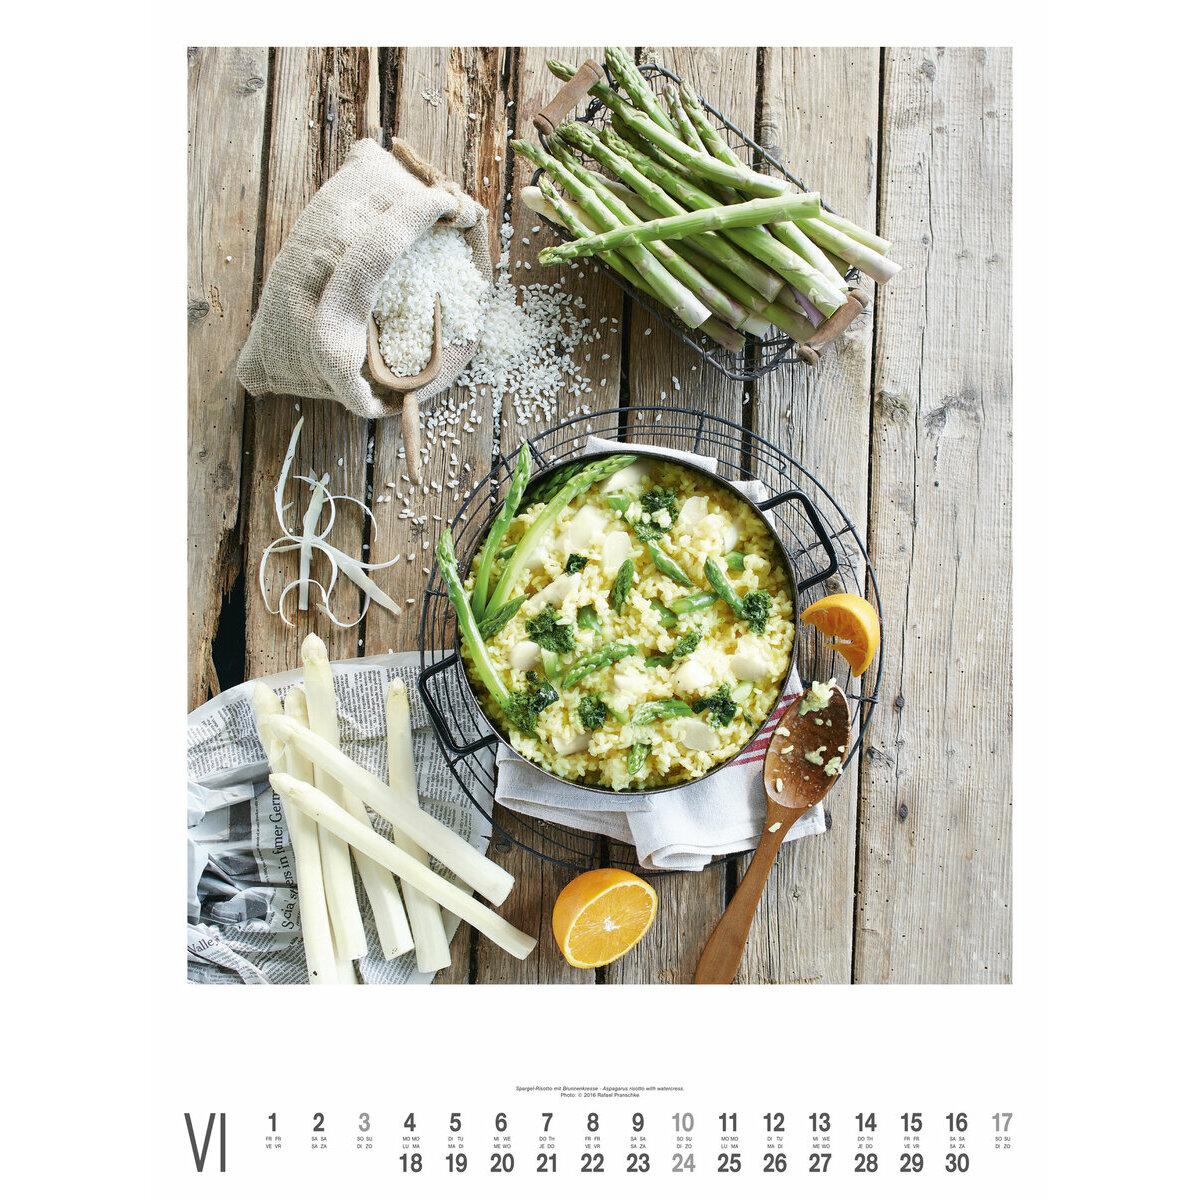 Maxi calendrier poster 2018 cuisine gourmande par rafael - France 3 cuisine gourmande ...